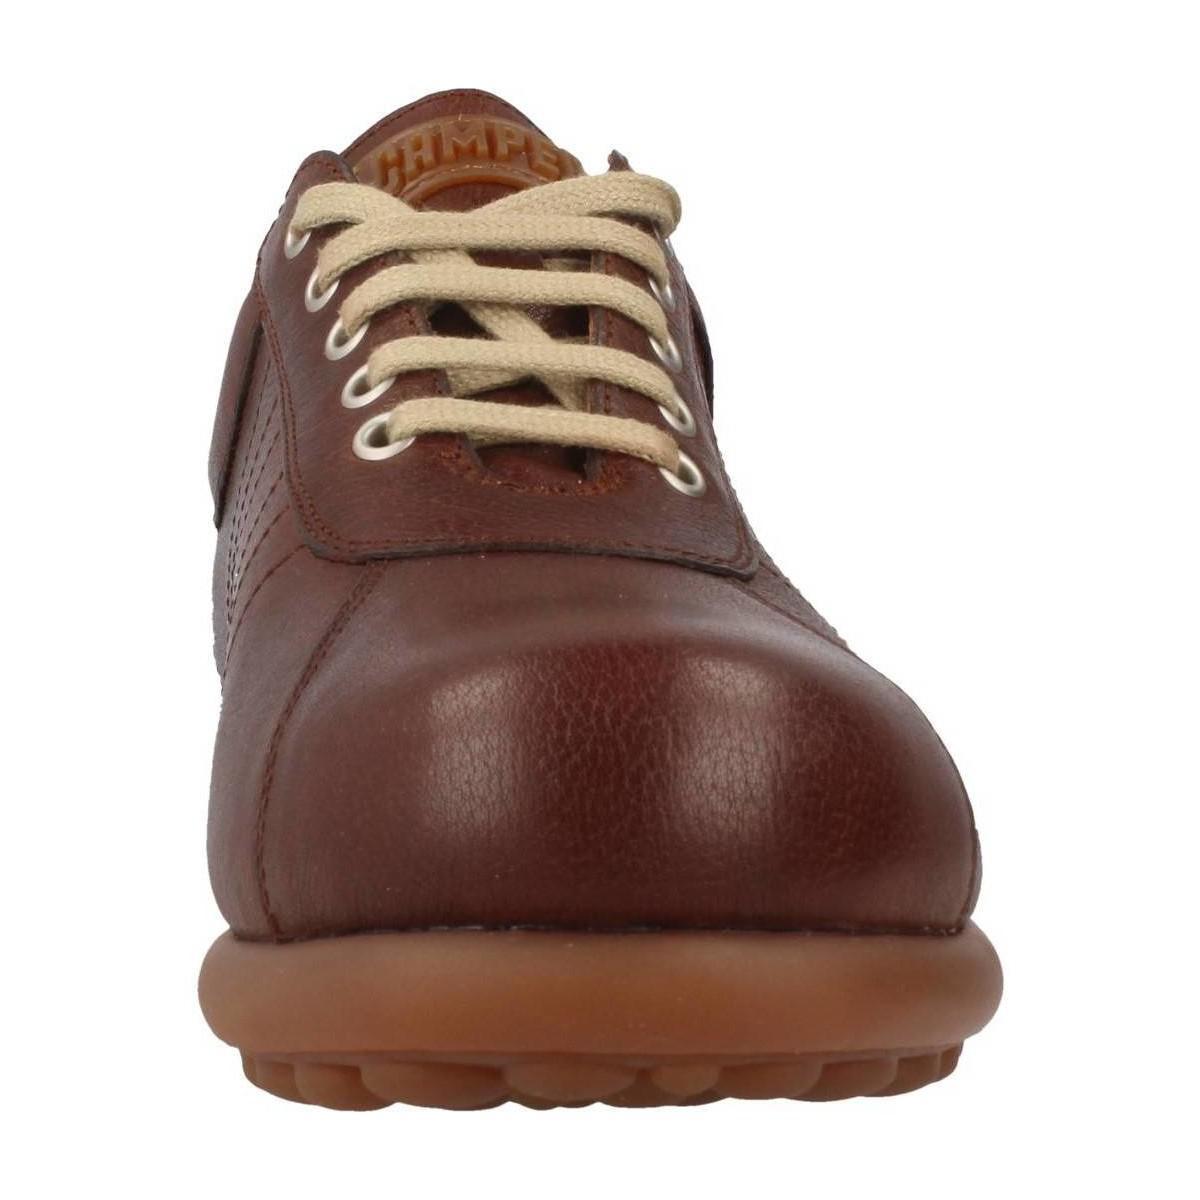 16002 194 Pelotas Ariel Men's Shoes (trainers) In Brown